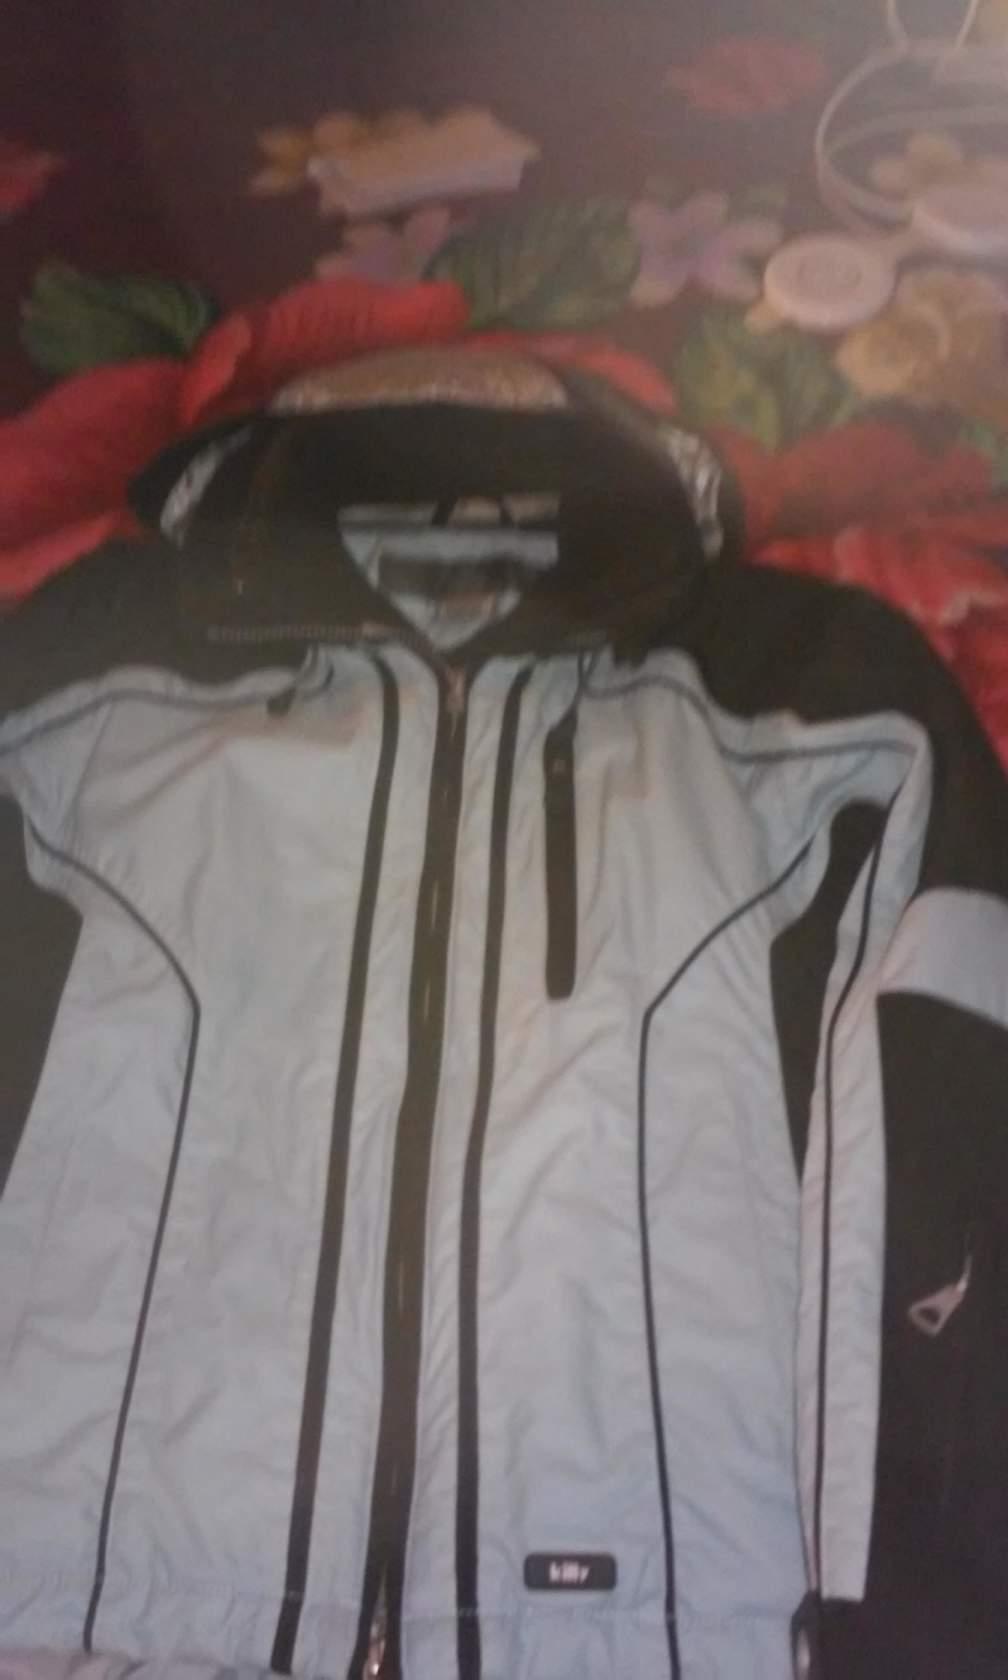 e7a8e14f530 Продается теплая горнолыжная курточка на девушку